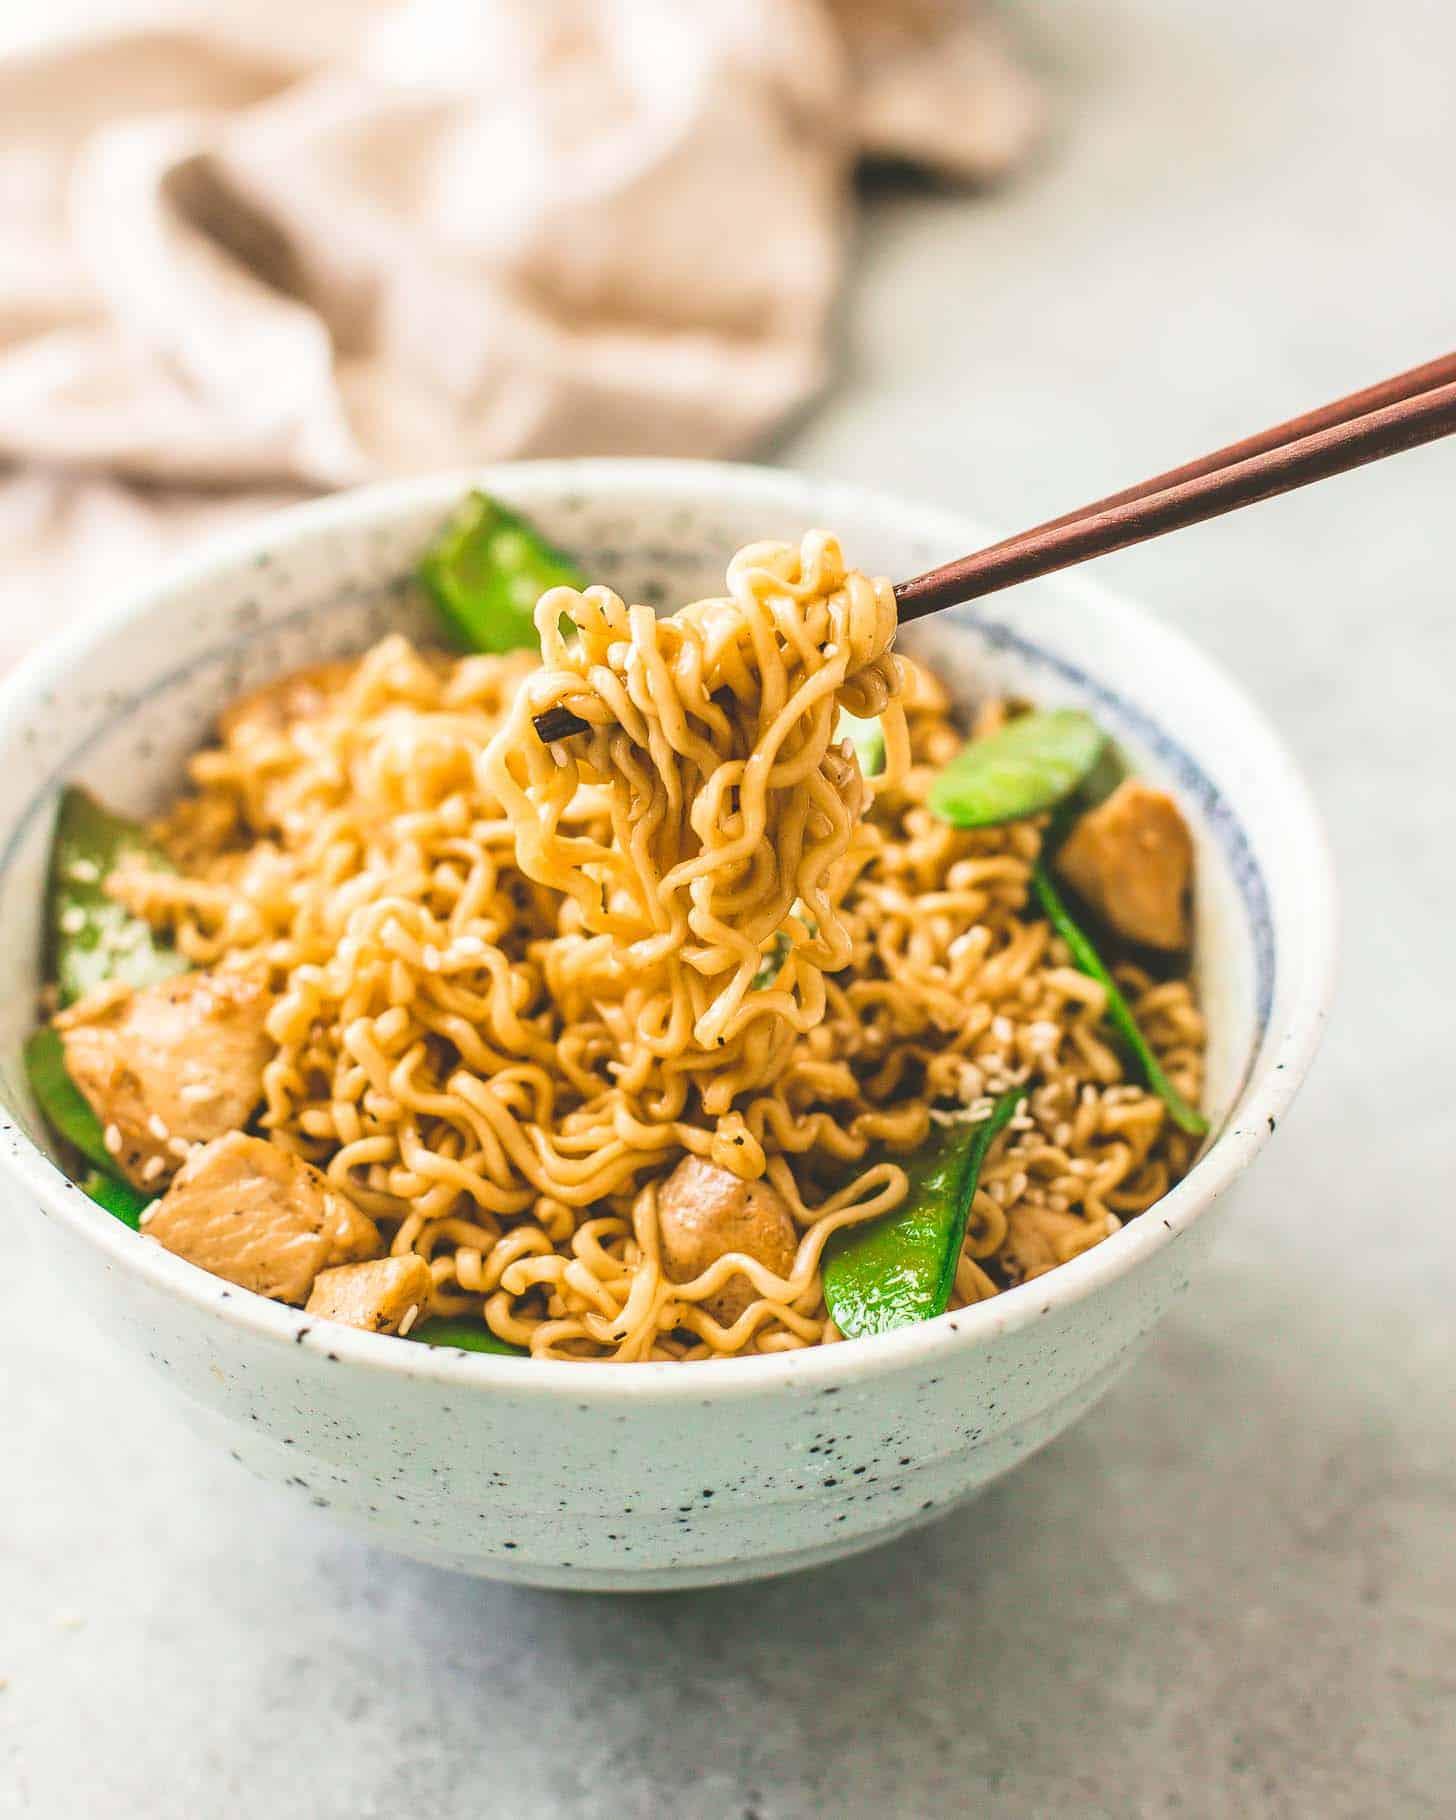 Sesame Garlic Ramen Stir-Fry in a bowl ready to eat with chopsticks